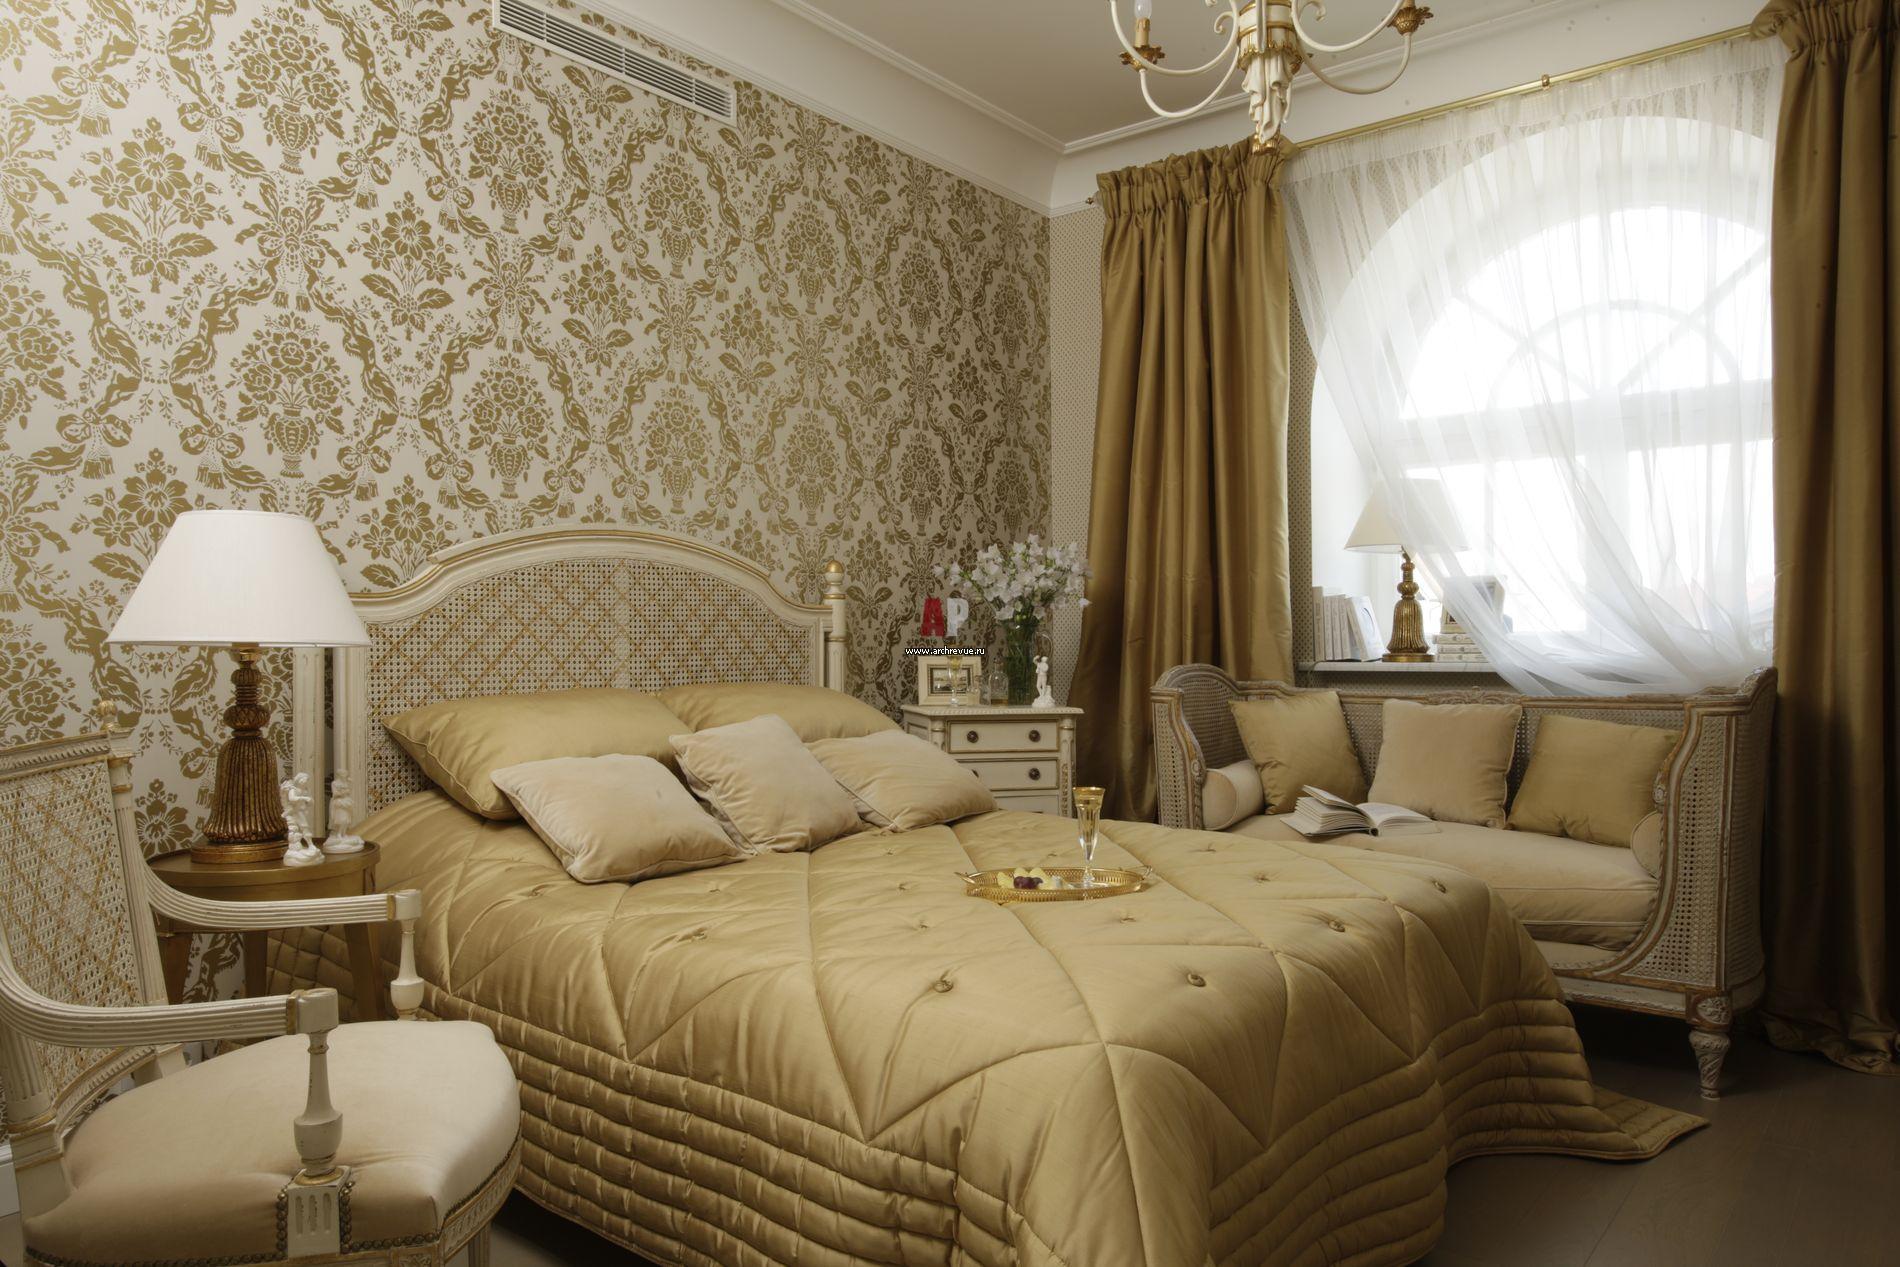 банкетка со спинкой и подушками у окна